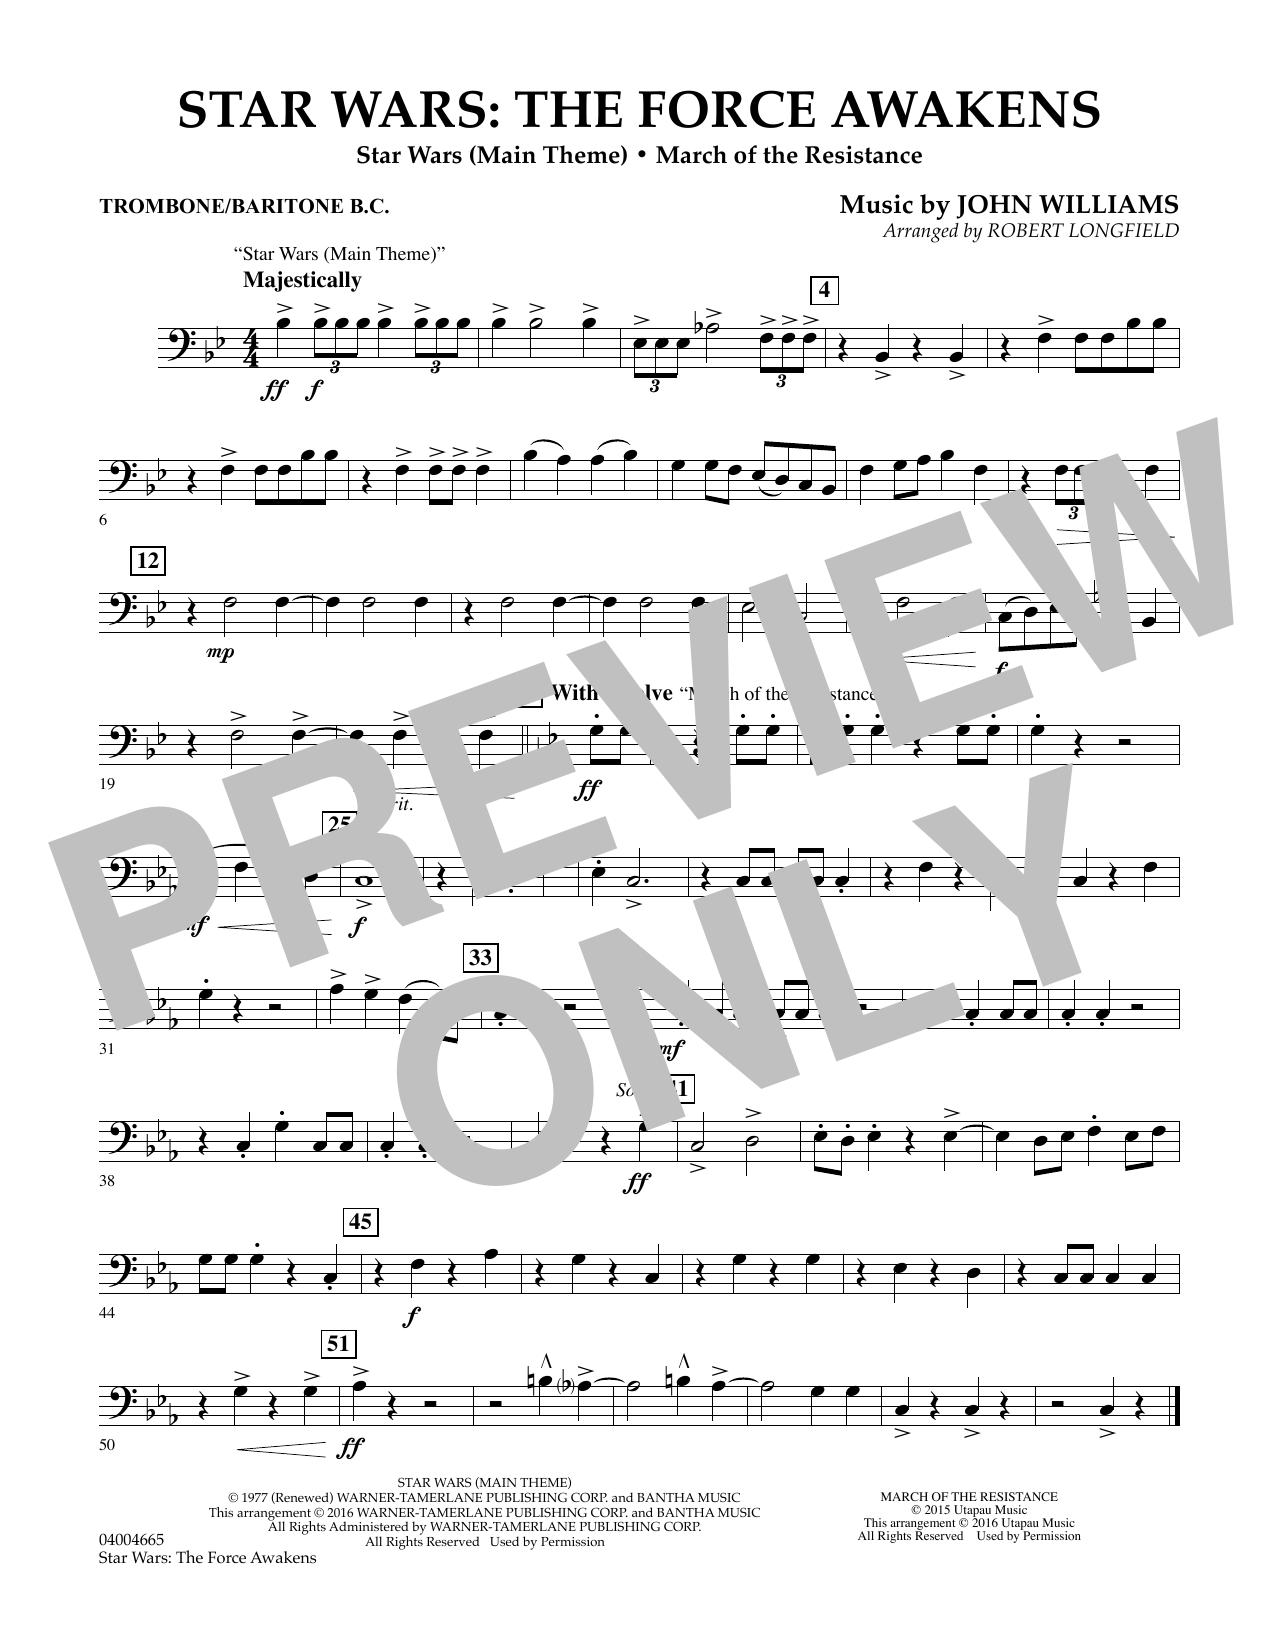 Star Wars: The Force Awakens - Trombone/Baritone B.C. (Concert Band)